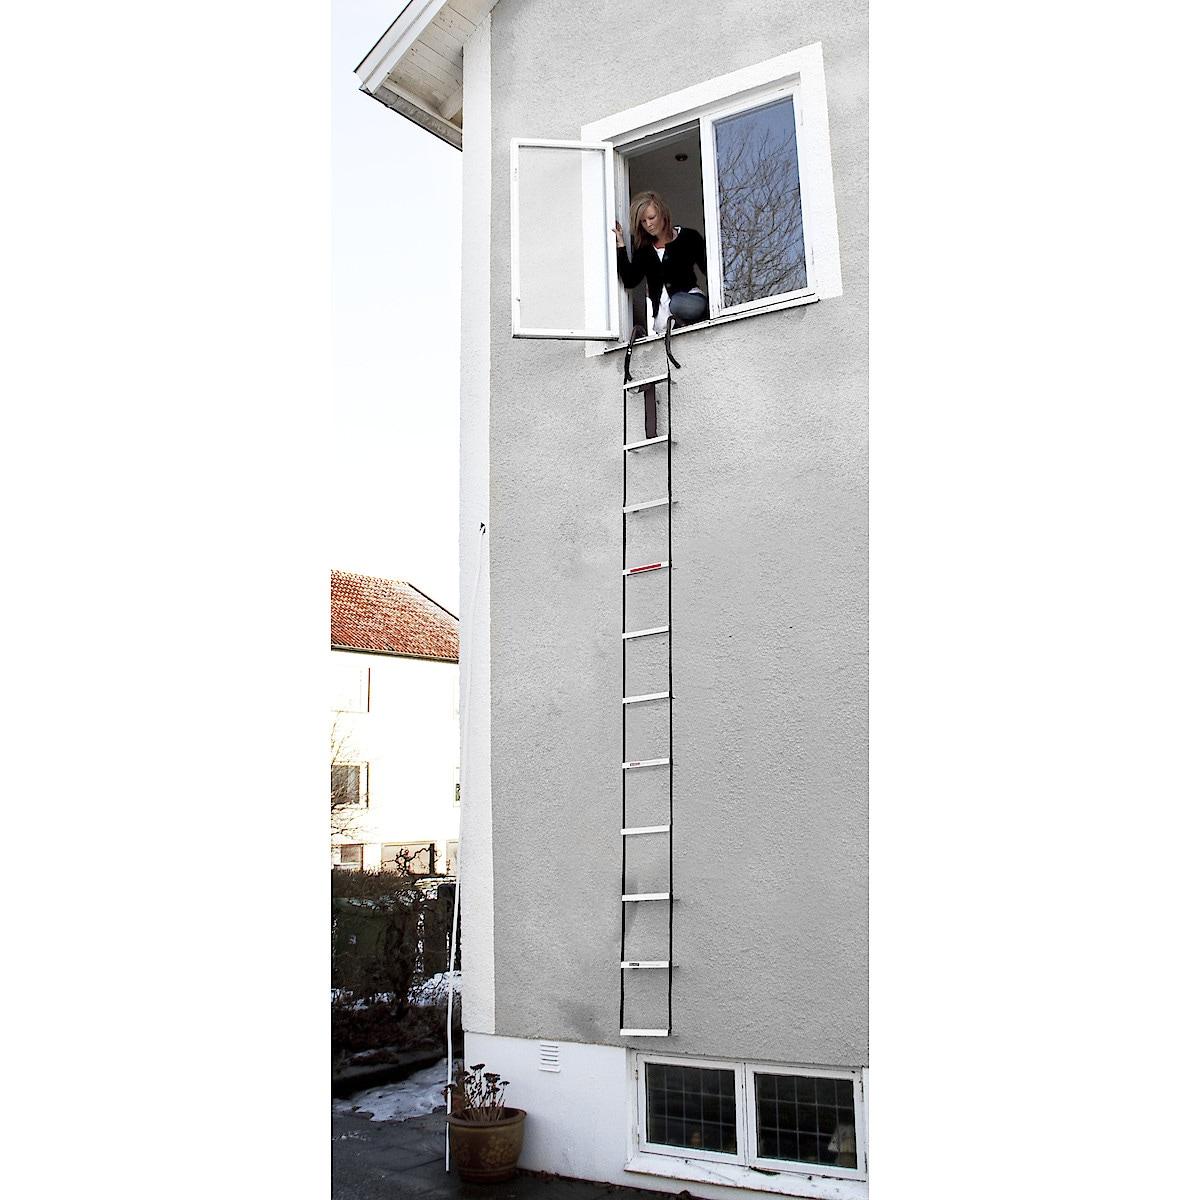 Brandstege Housegard 4,5 m